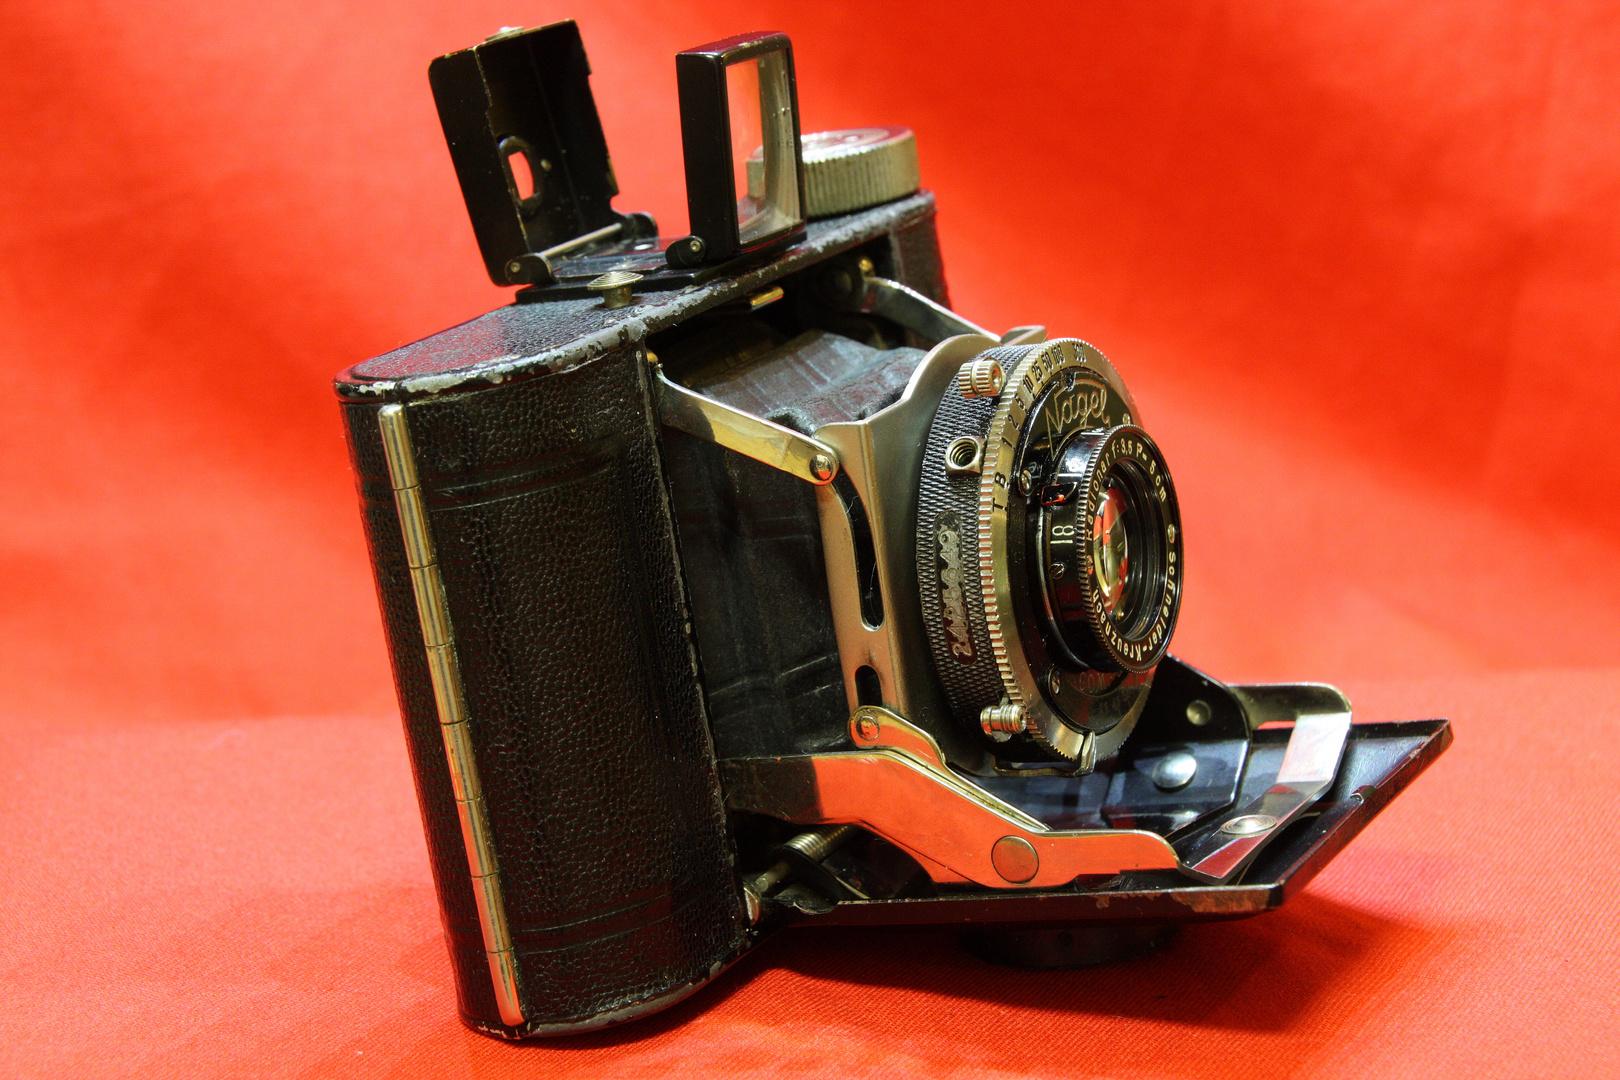 Fotoapparat meines Vaters